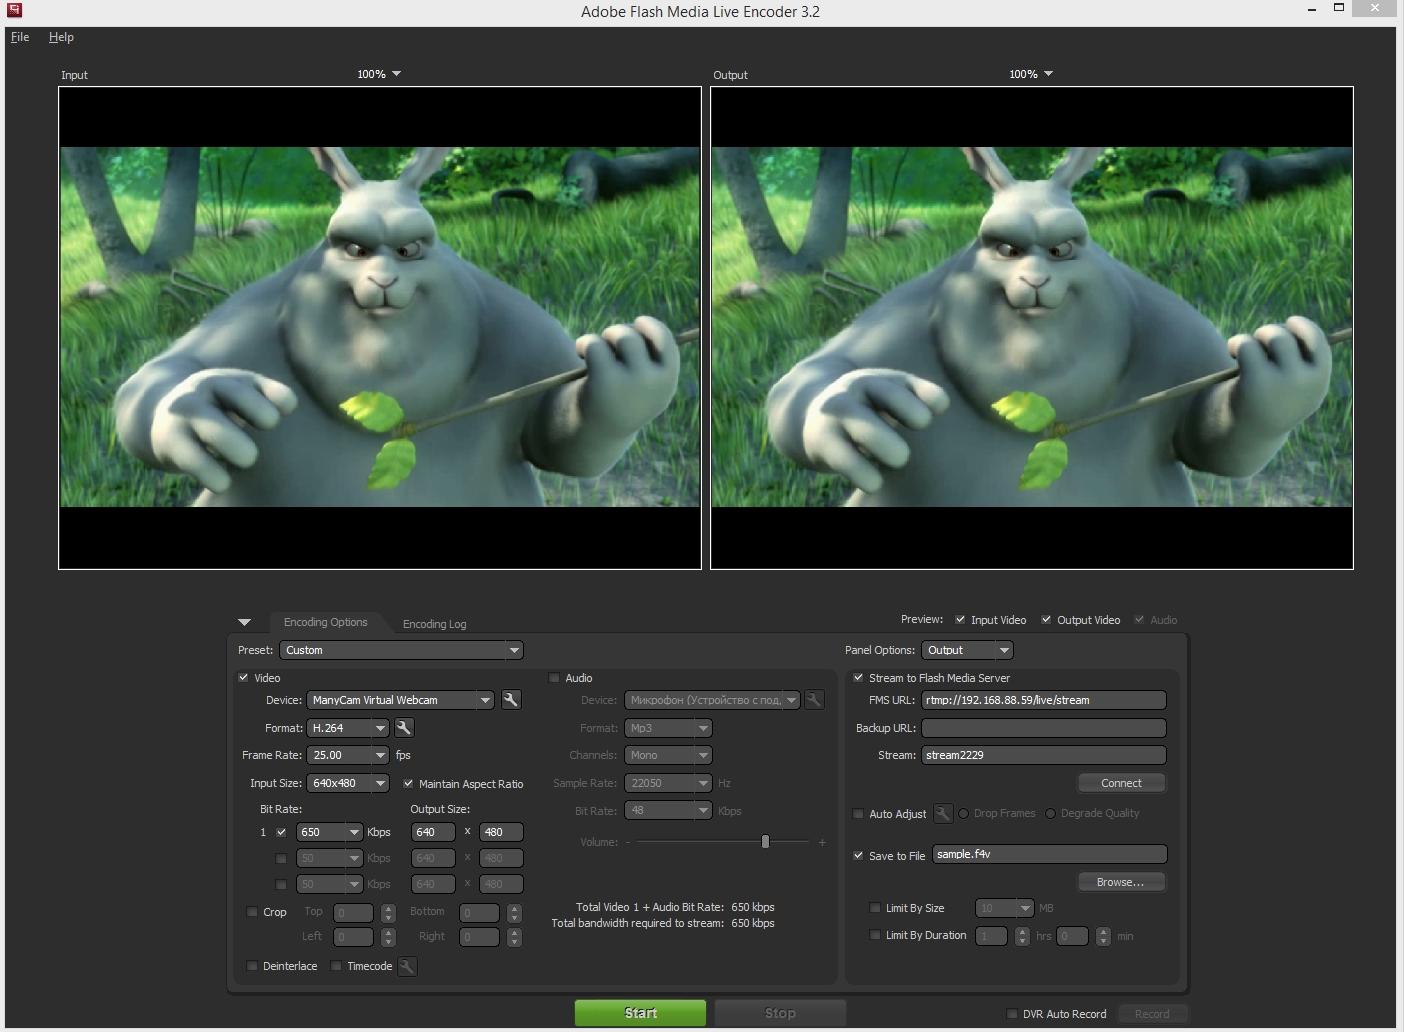 Stream RTMP video stream from the Live Encoder on WebRTC   Streaming